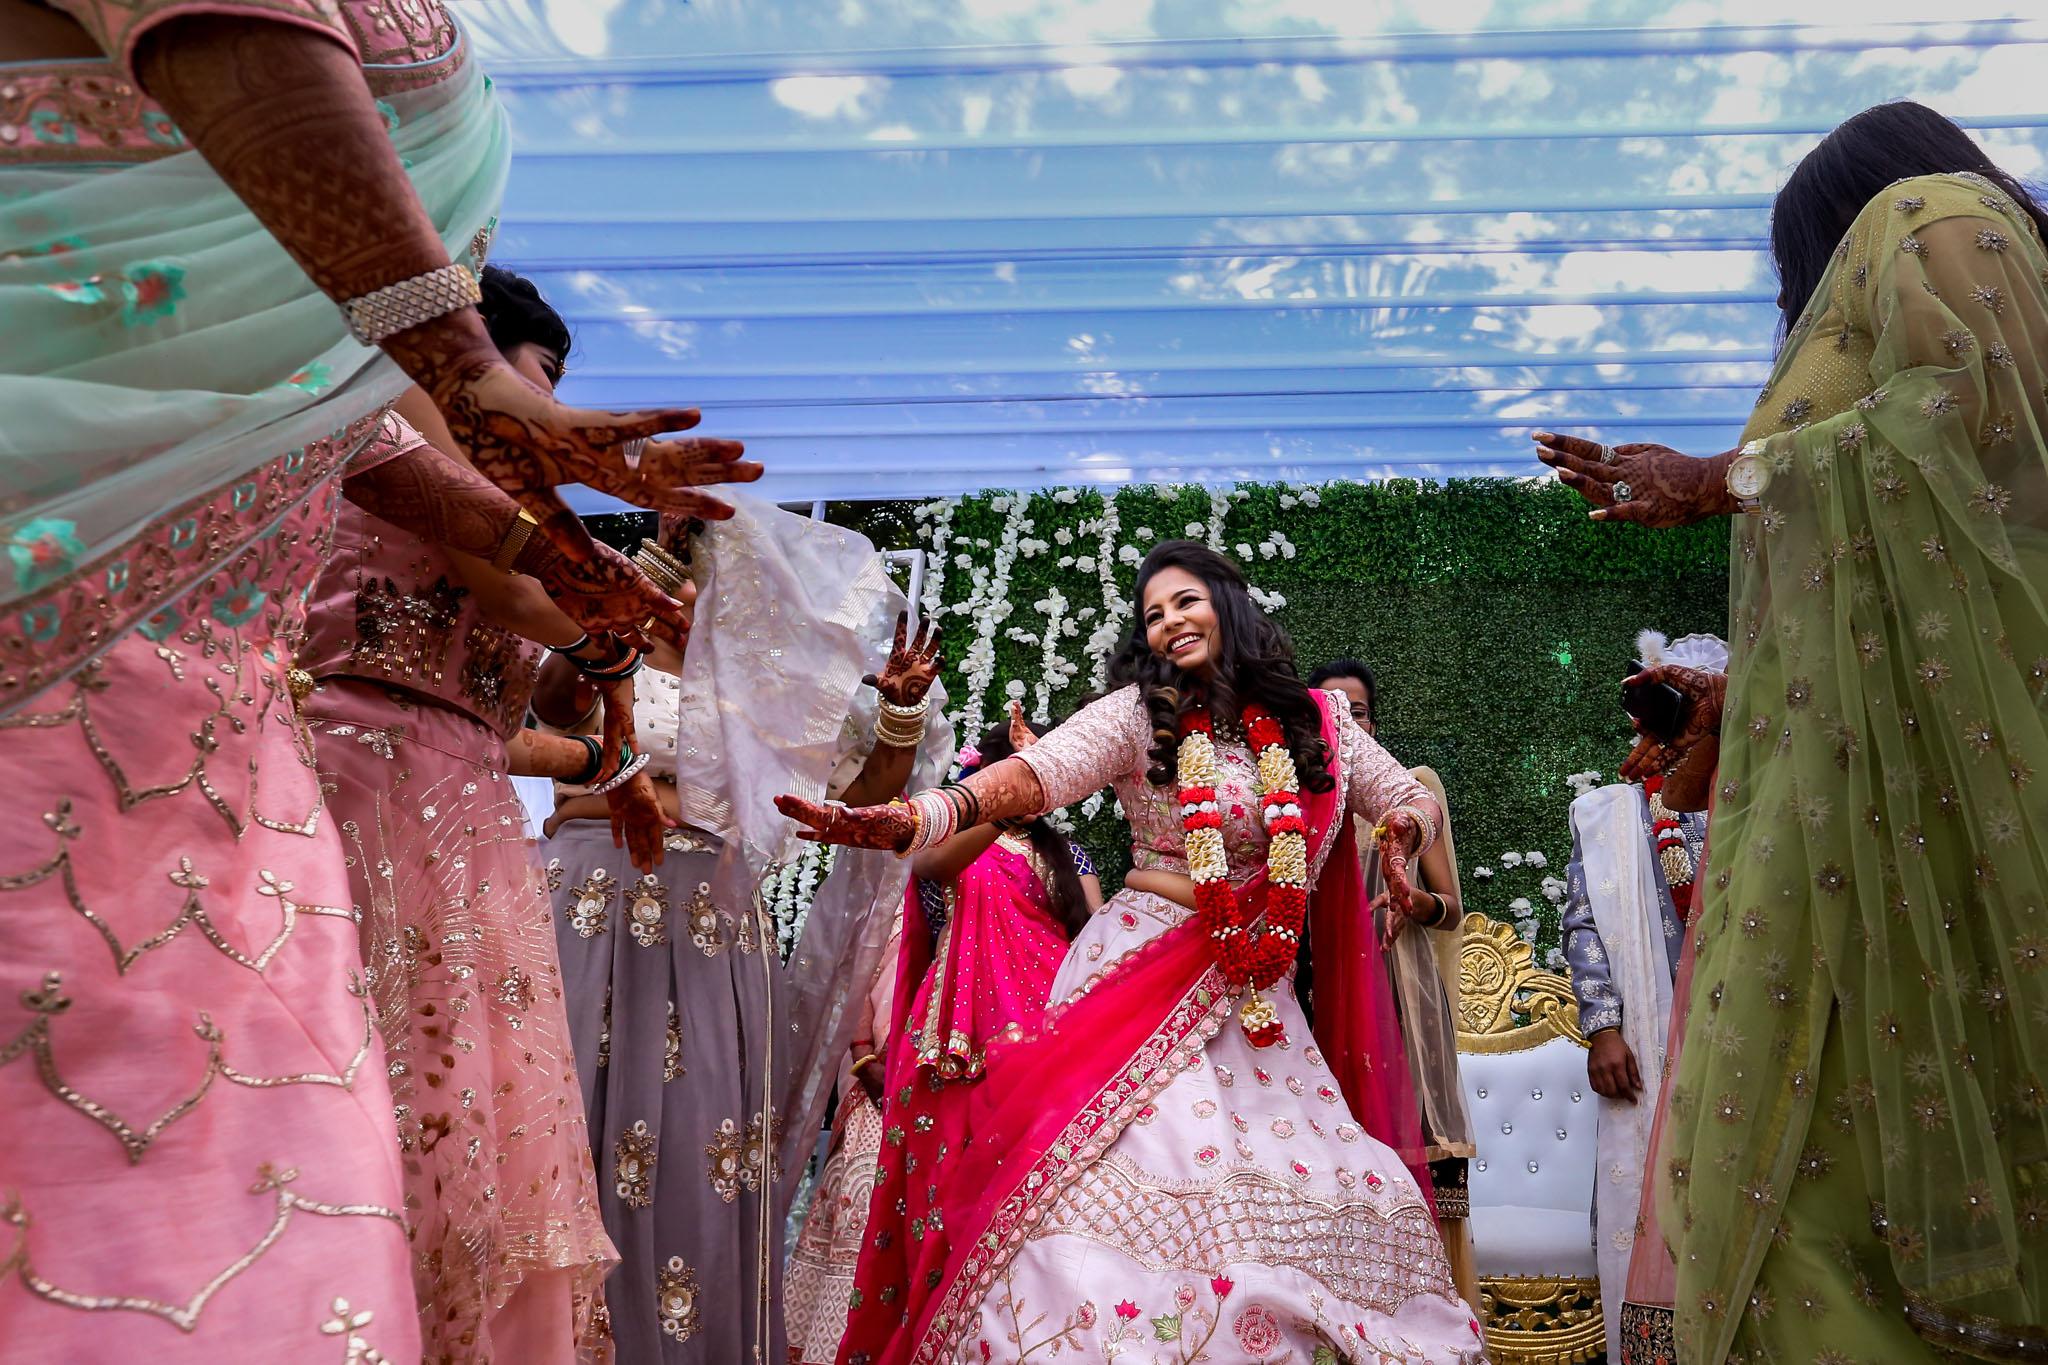 Mukti x Ojas Wedding Akshjay Sansare Photography Best wedding photographer in mumbai India Candid Cinematic Films videos-39.jpg